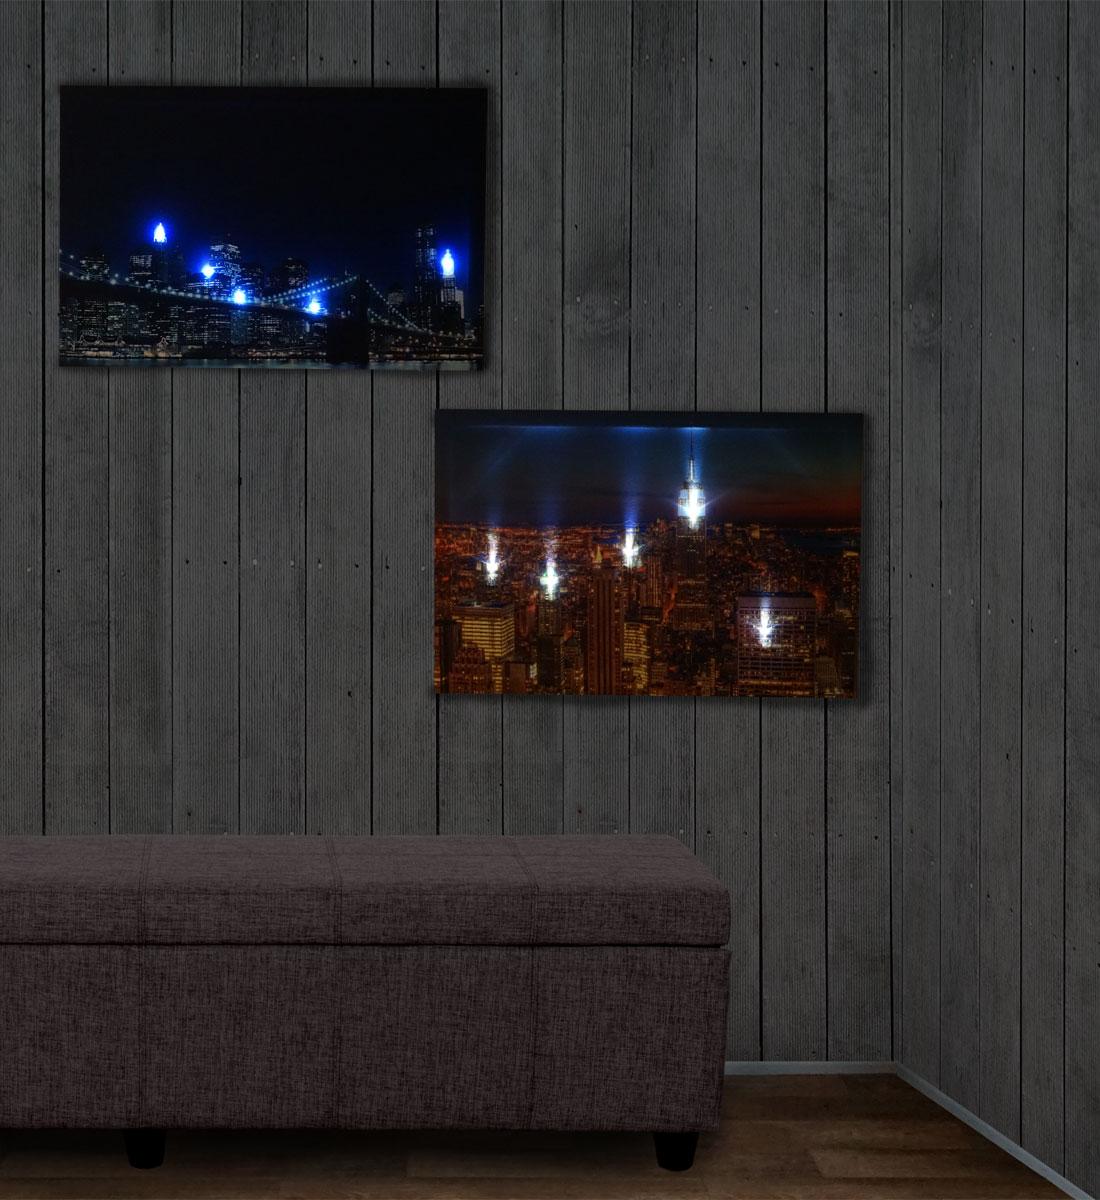 2x led bild mit beleuchtung leinwandbild wandbild. Black Bedroom Furniture Sets. Home Design Ideas